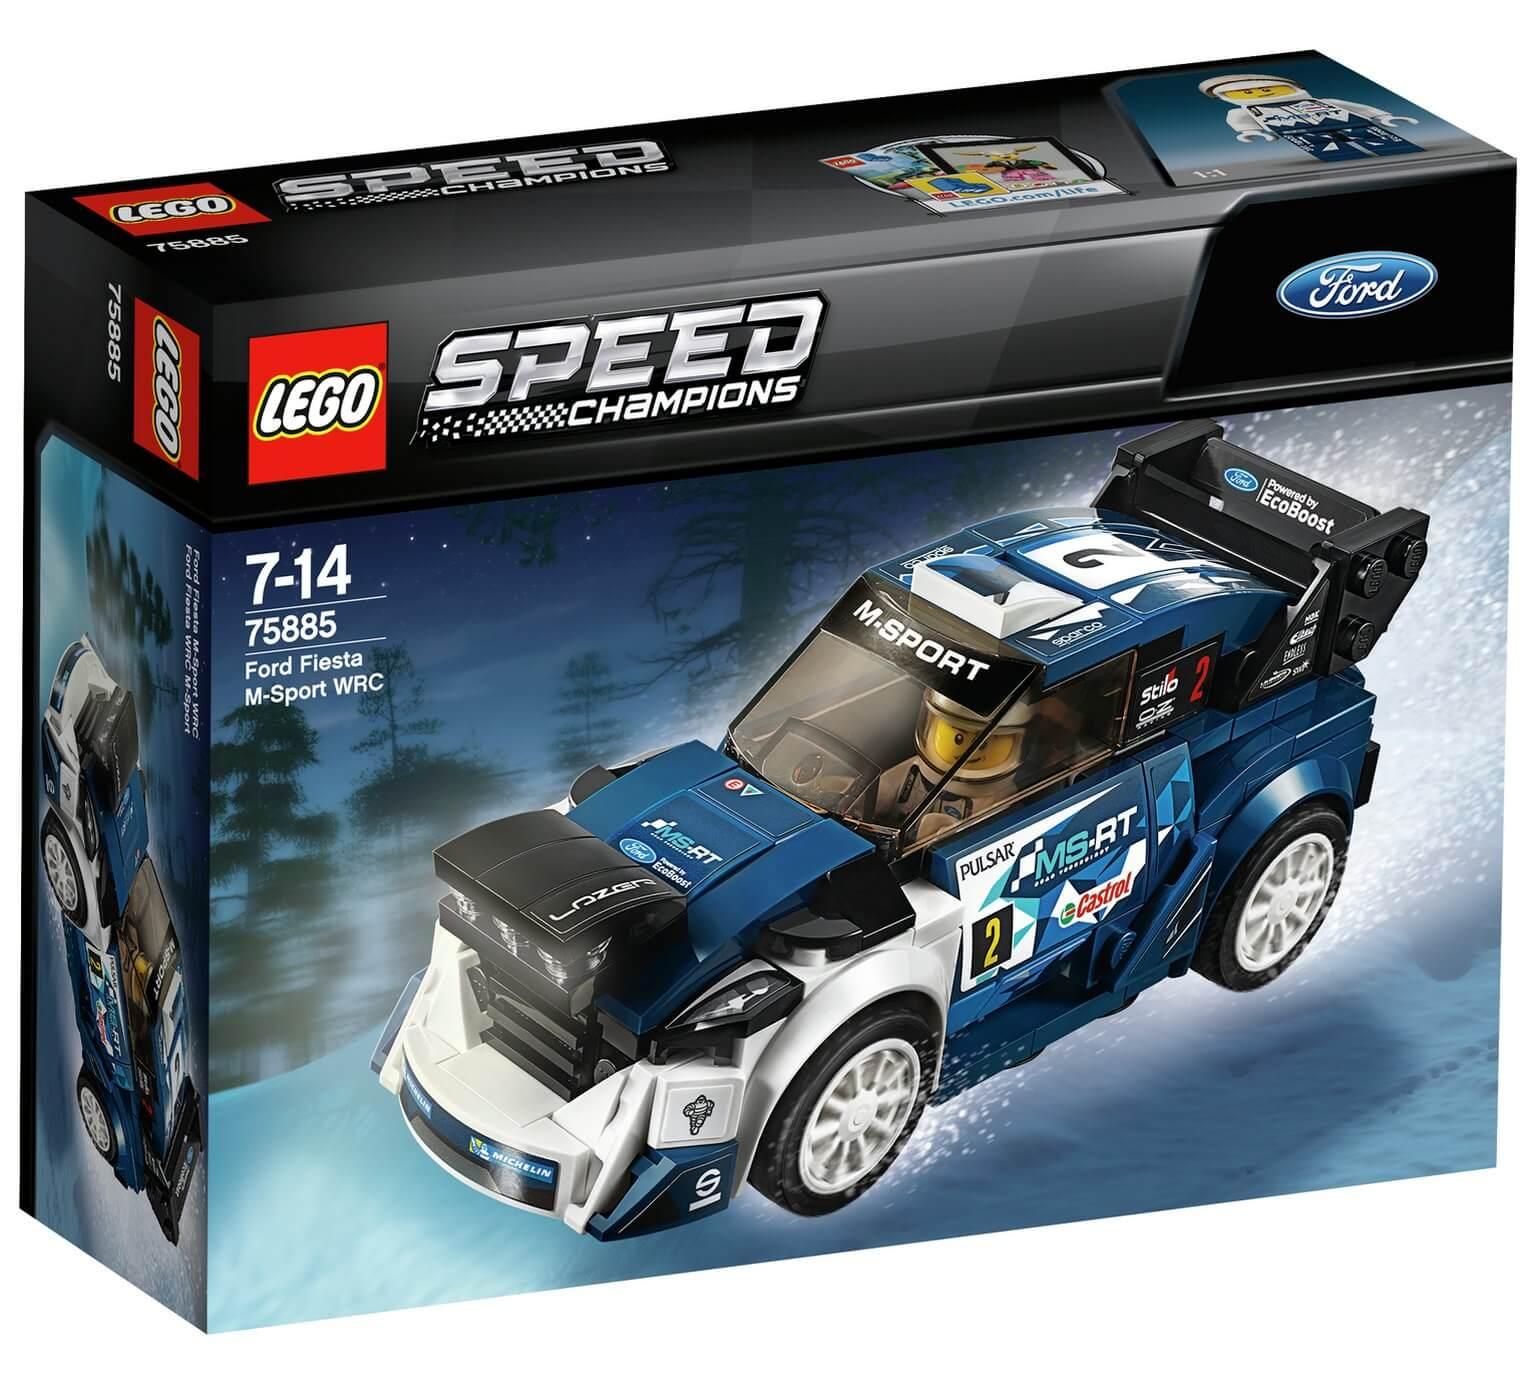 Mua đồ chơi LEGO 75885 - LEGO Speed Champion 75885 - Siêu Xe Ford Fiesta M-Sport WRC (LEGO Speed Champion 75885 Ford Fiesta M-Sport WRC)